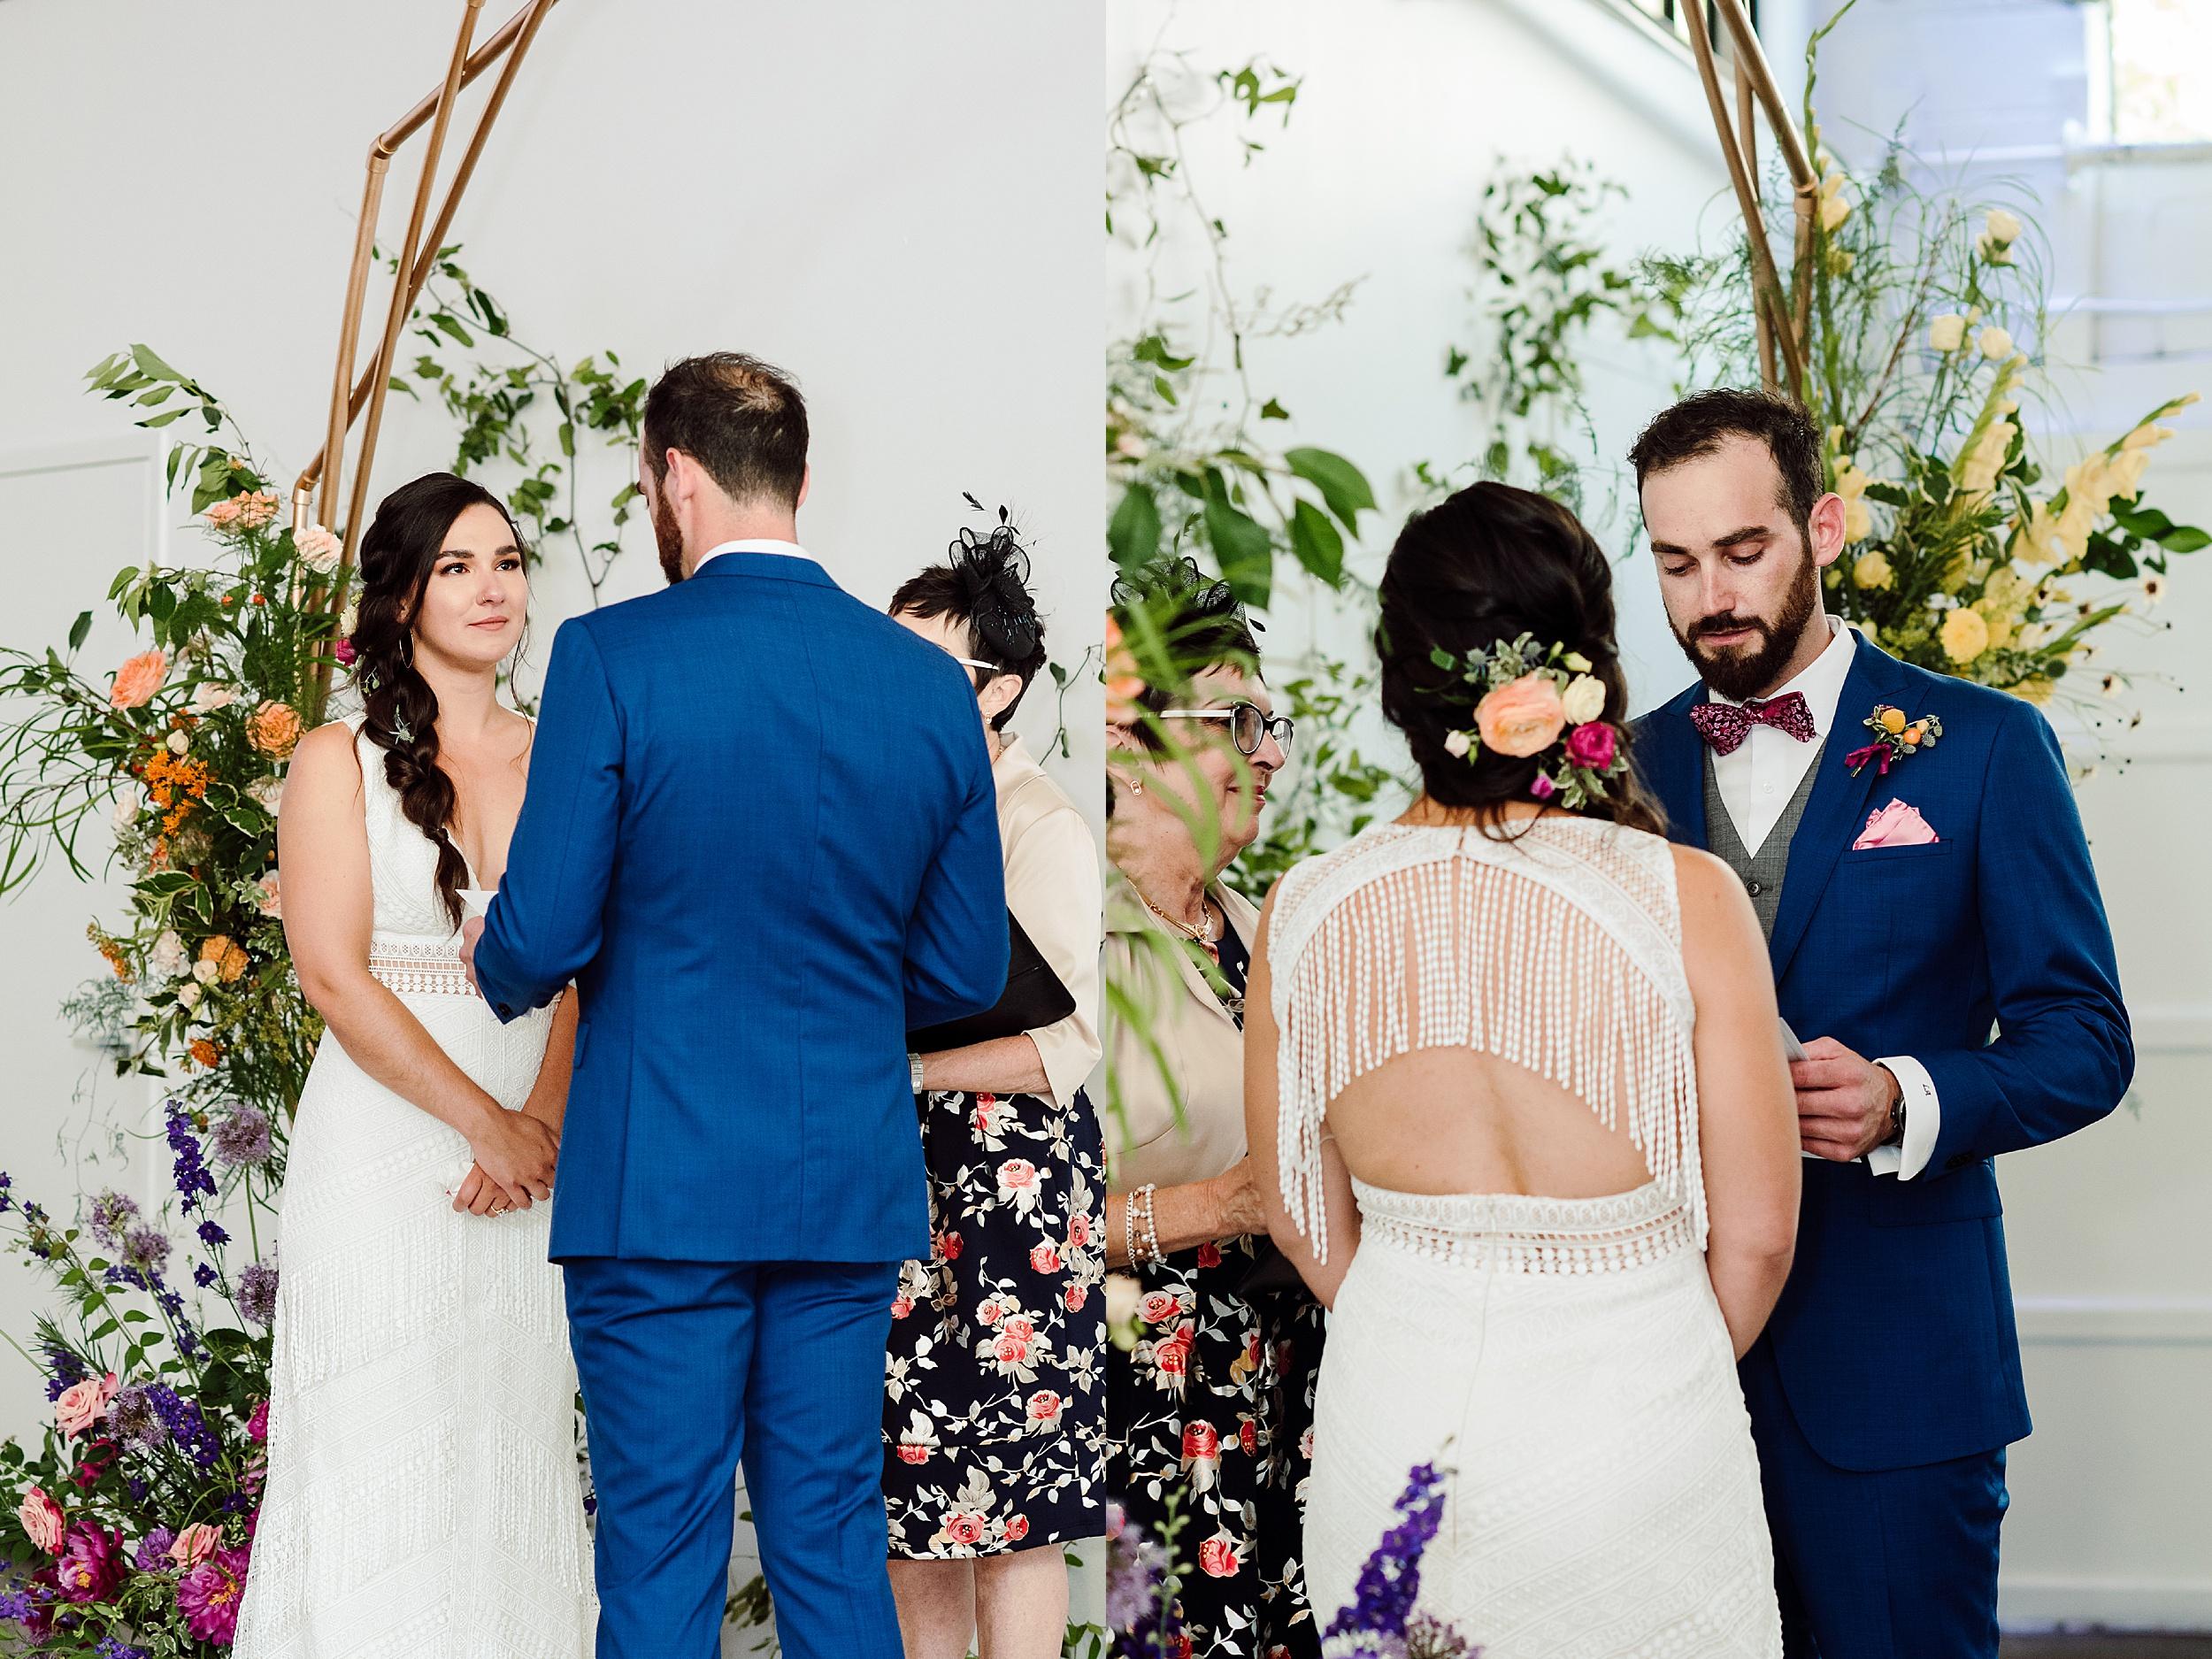 Airship-37-Berkeley-Events-Distillery-District-Wedding-Toronto-Wedding-Photographers_0068.jpg